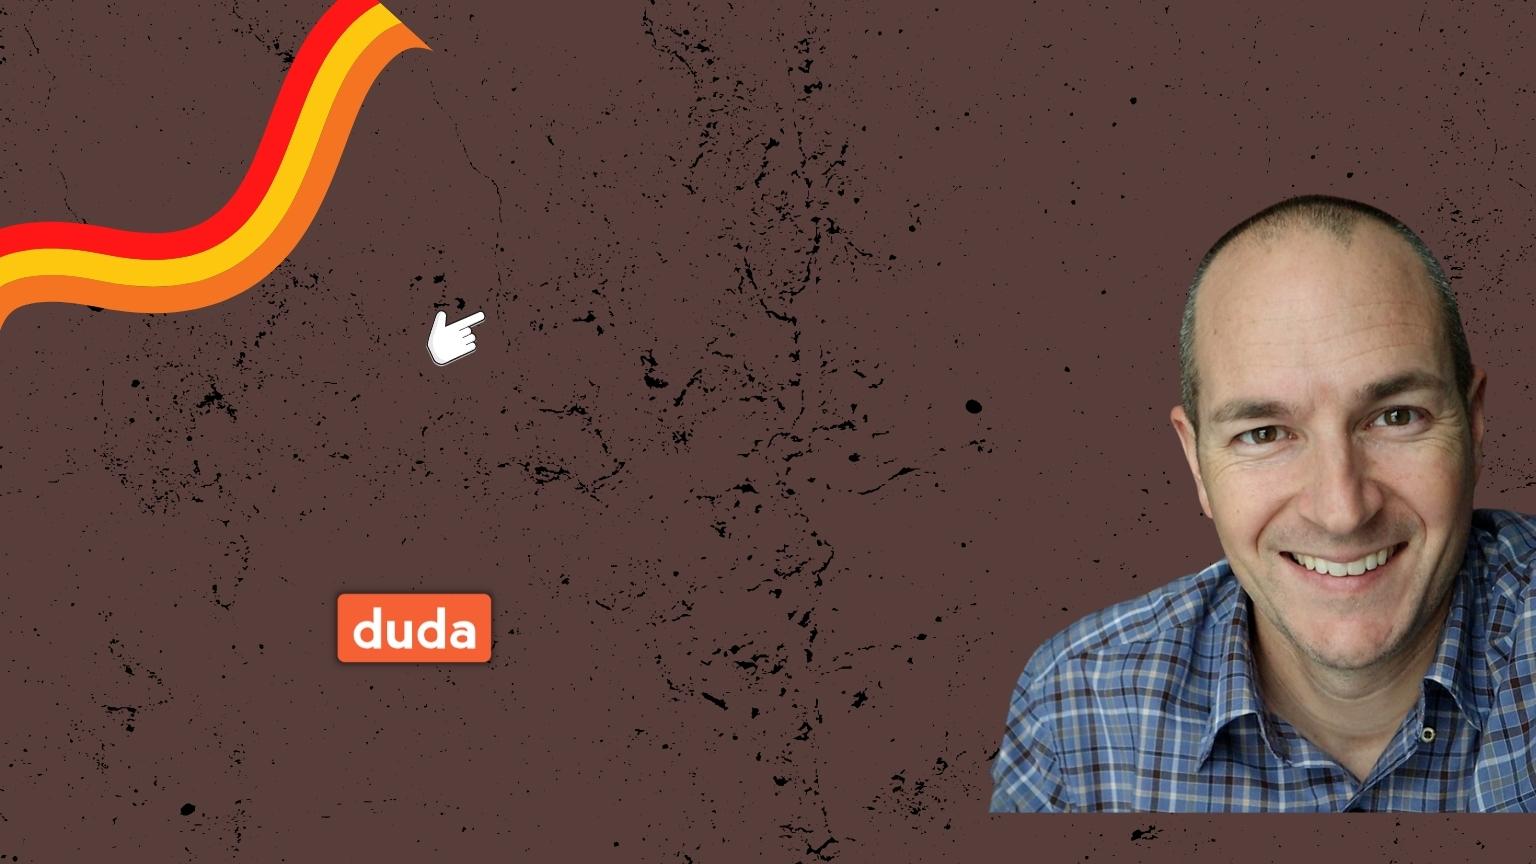 duda website builder coaching training education